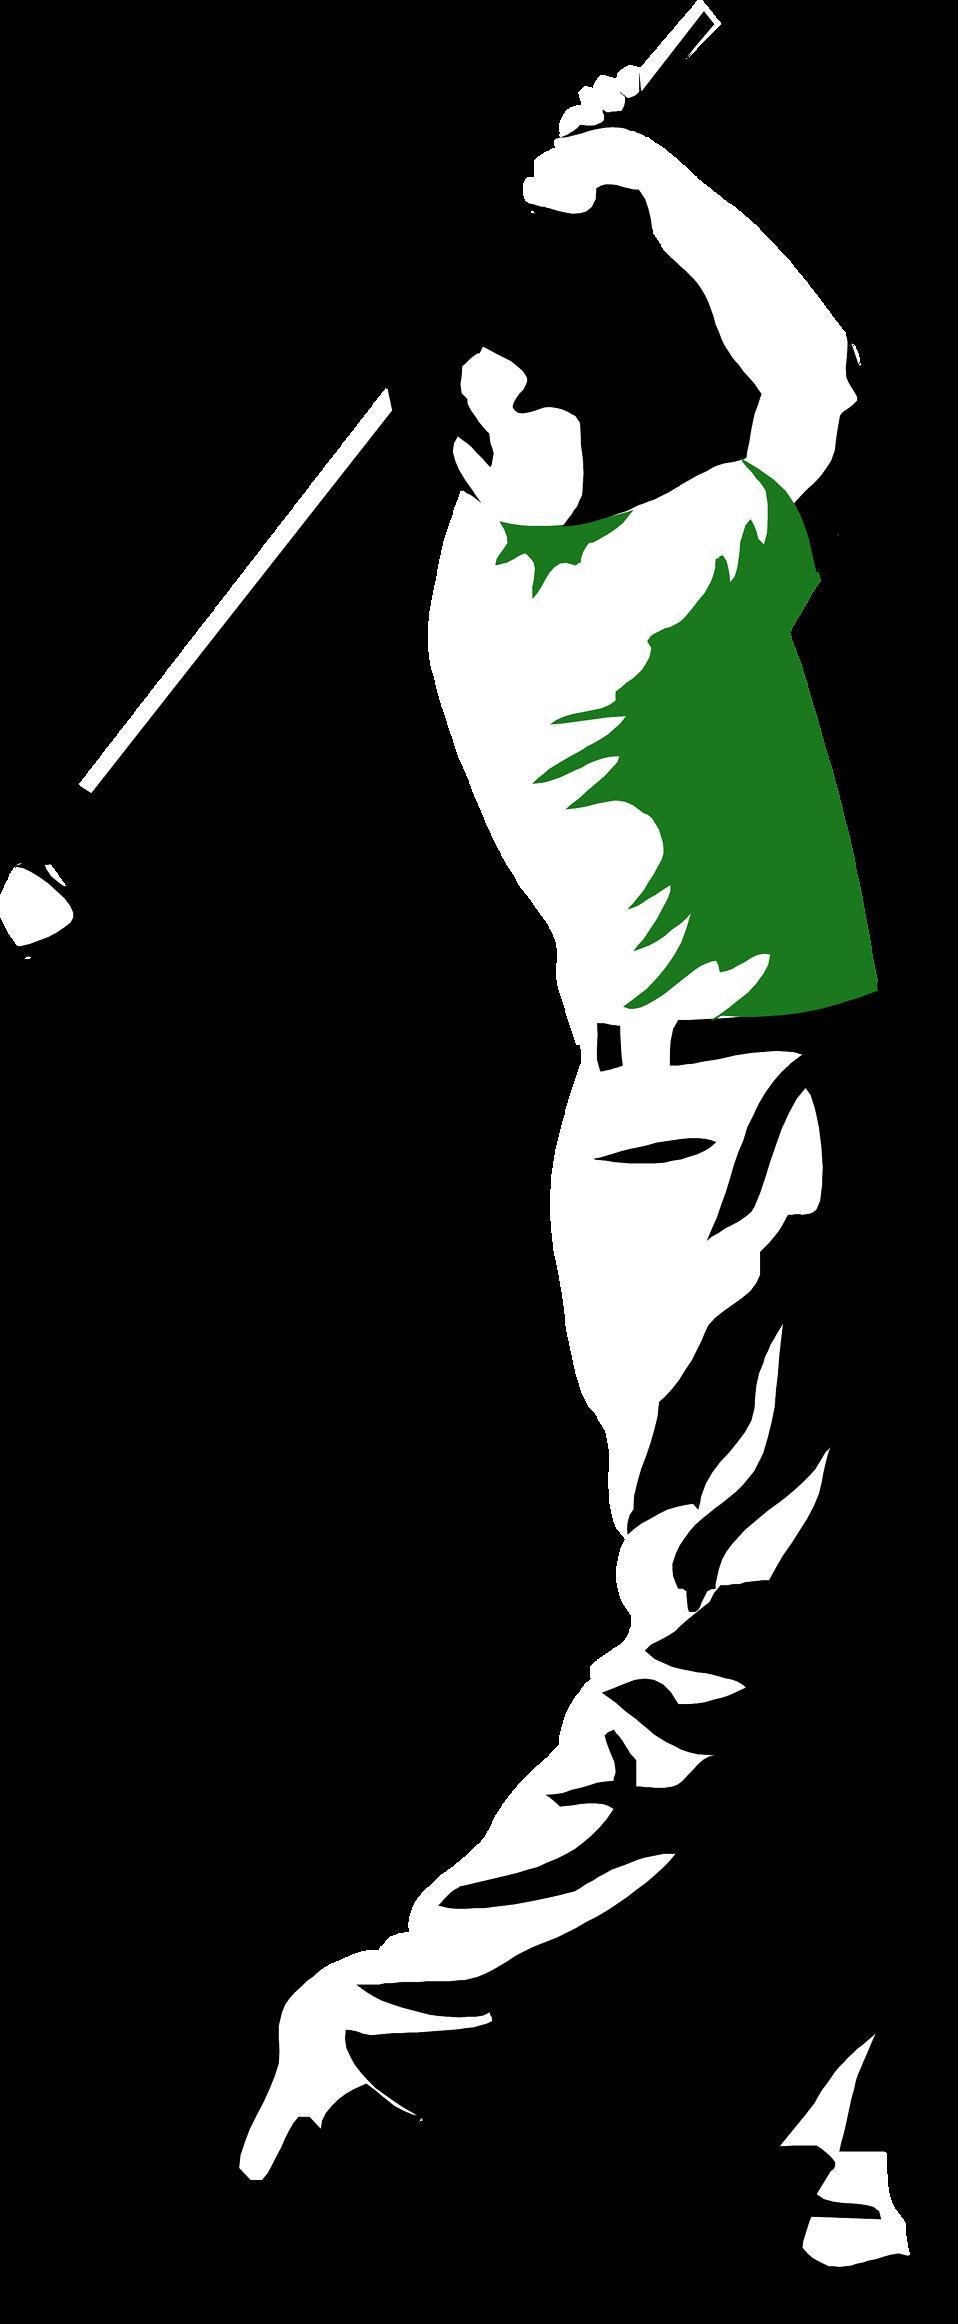 Golf free stock photo. Golfer clipart avatar